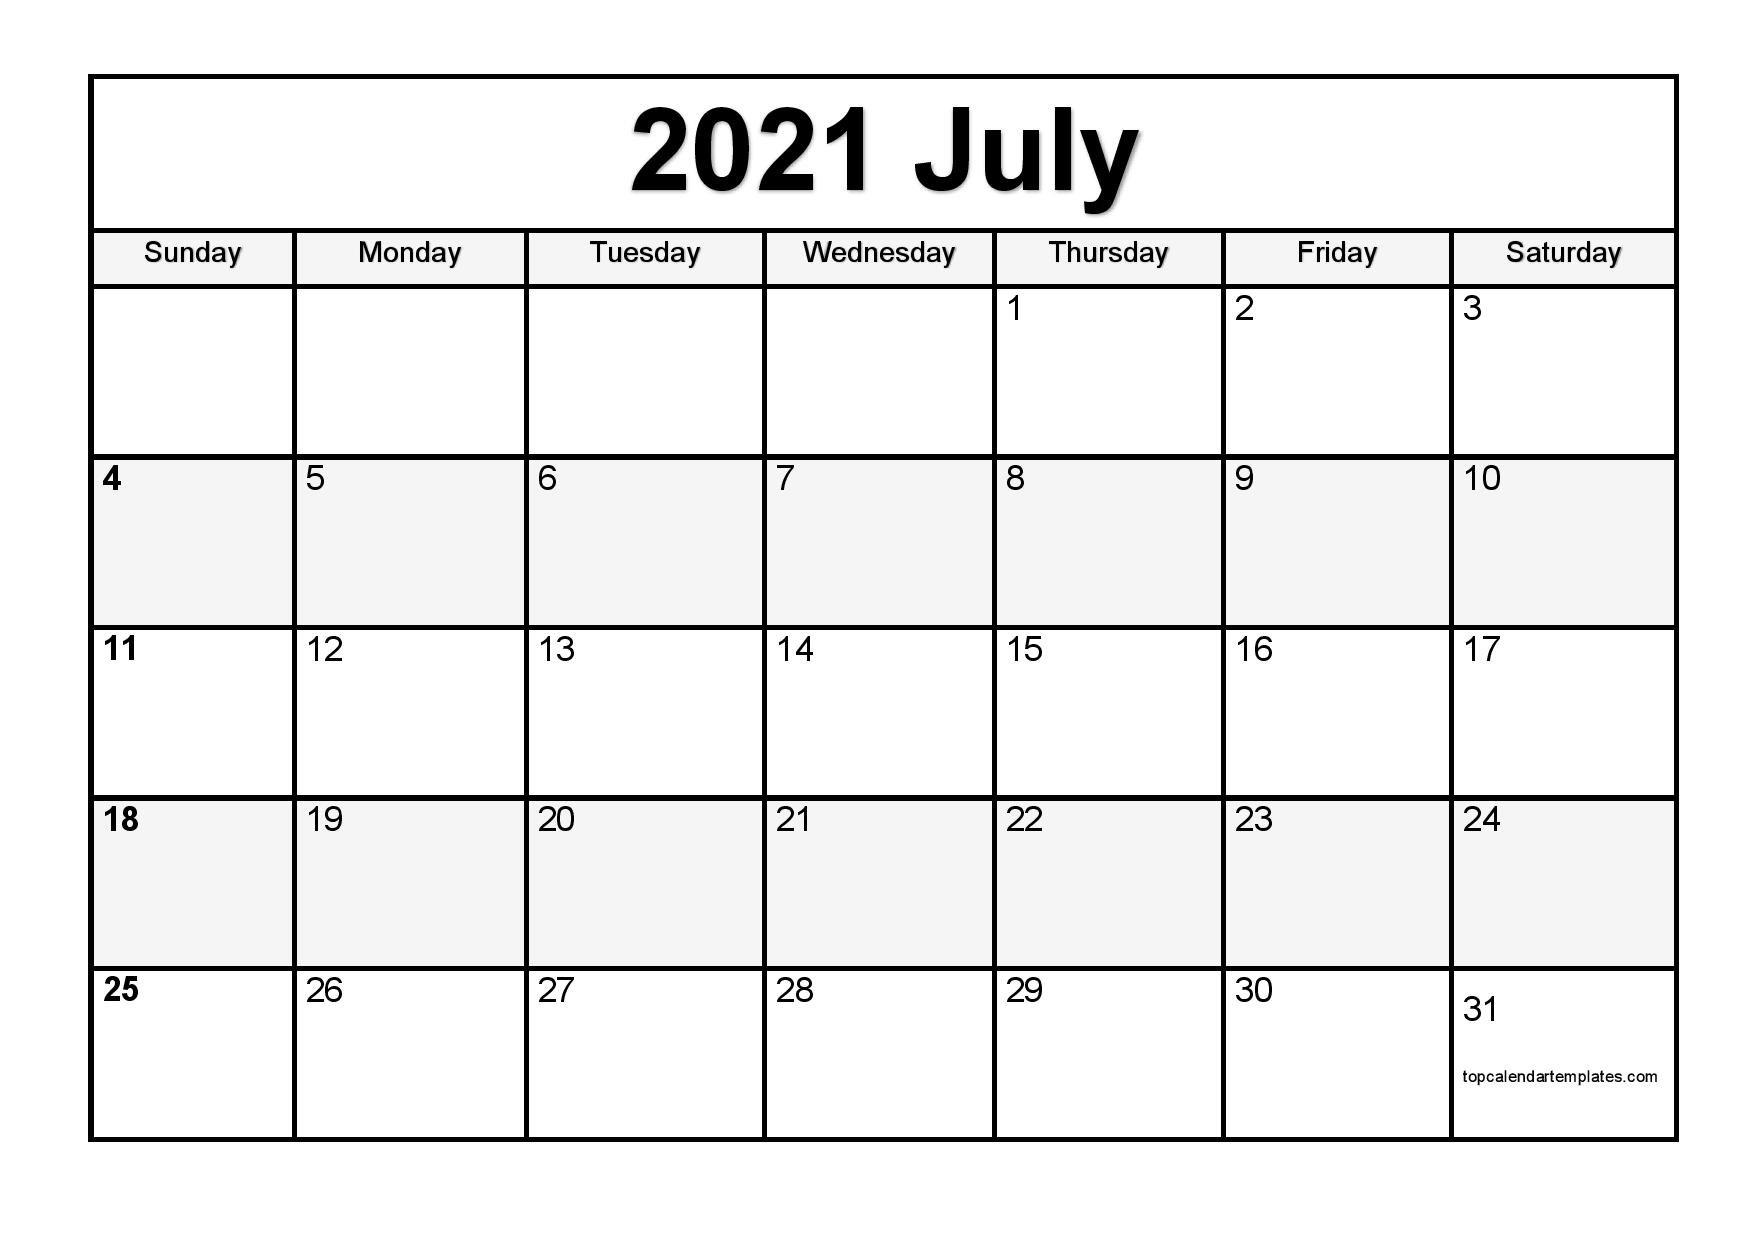 Printable July 2021 Calendar Template - Pdf, Word, Excel Free Bold Printable Calnder Jully